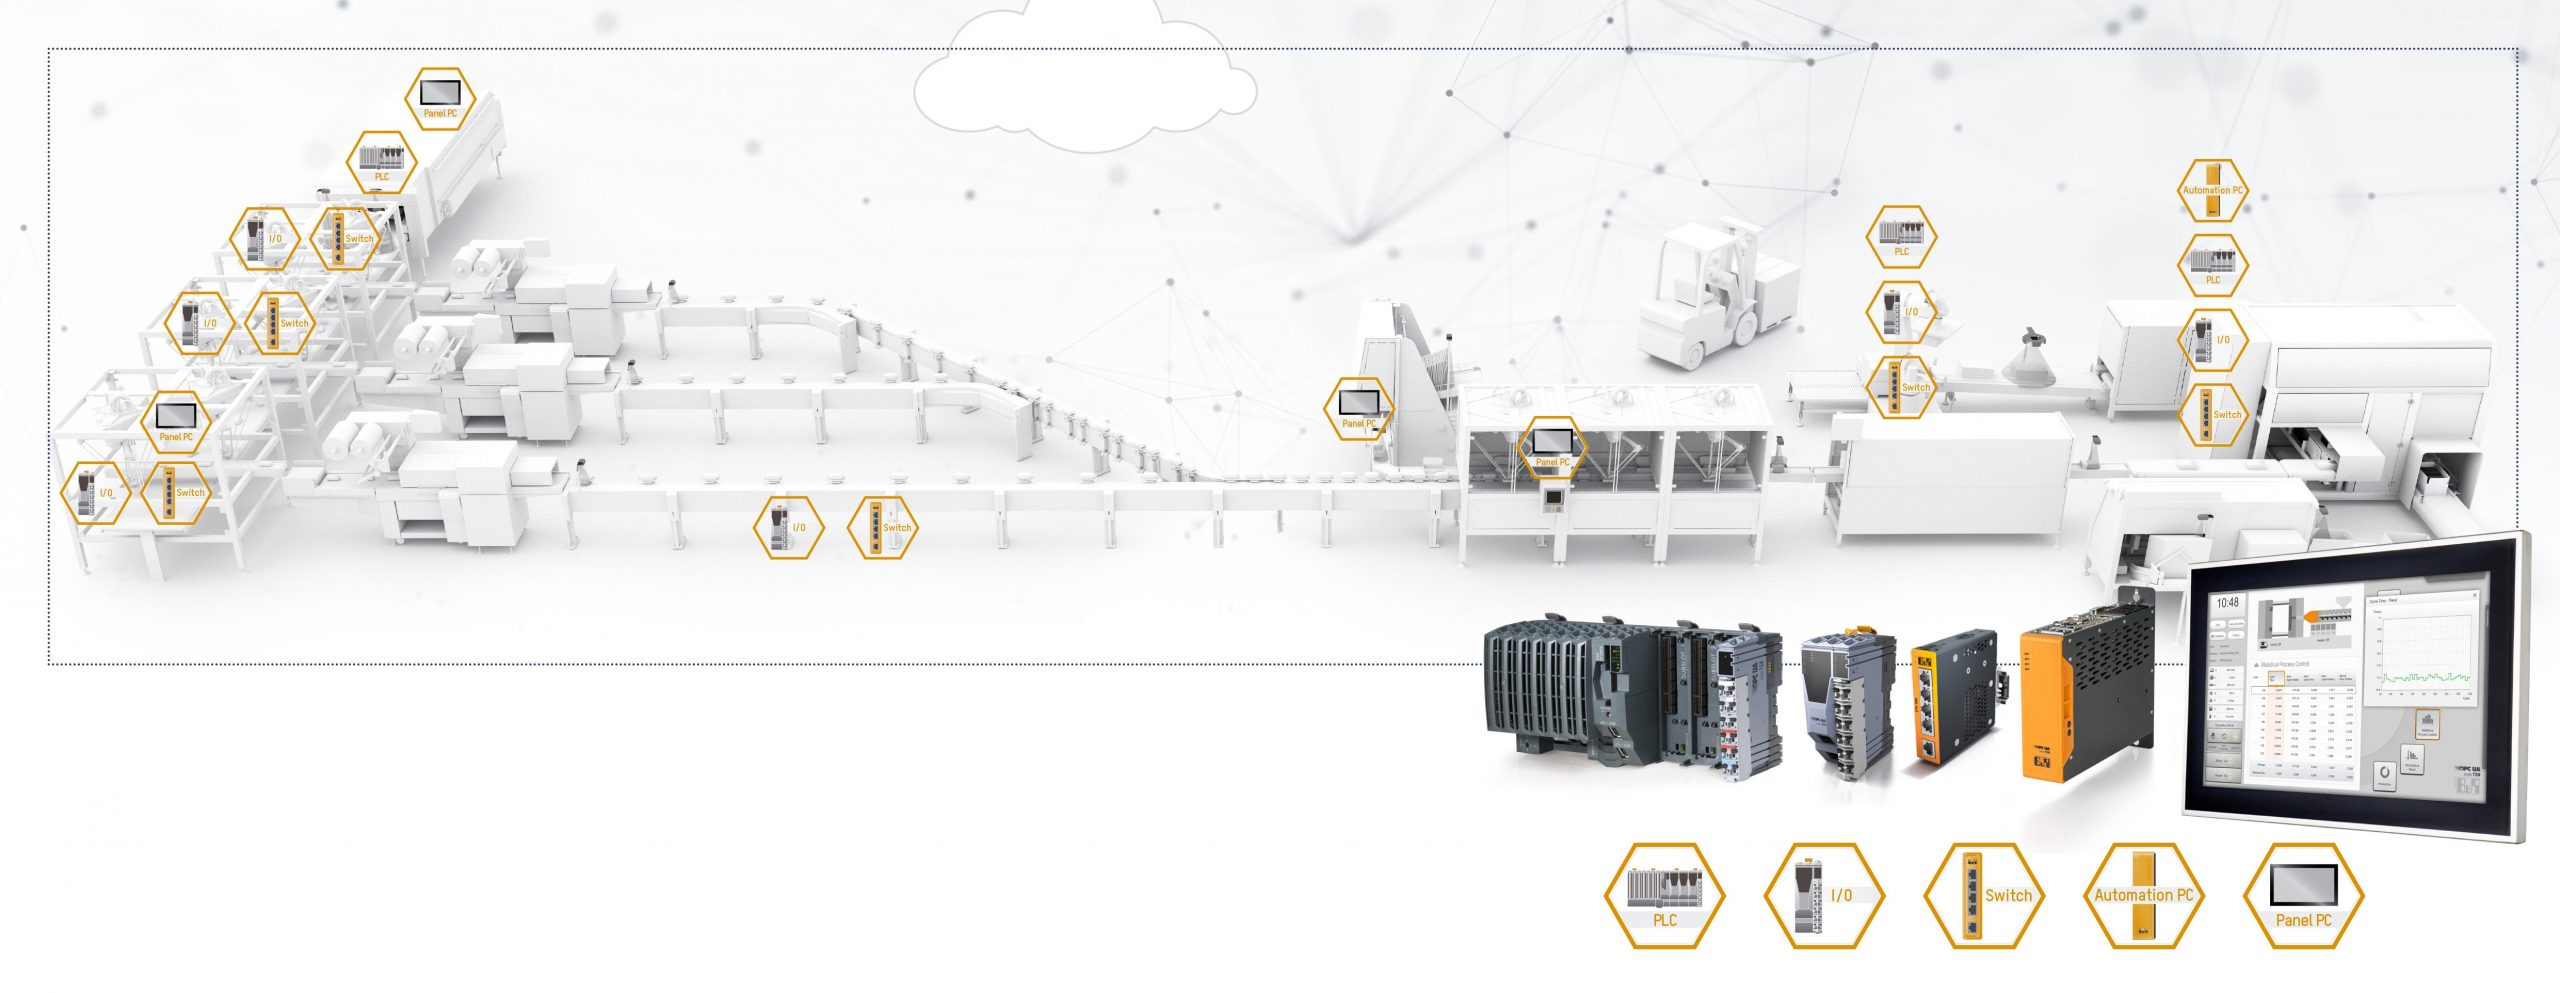 Softwarepaket für interoperable OPC-UA-over-TSN-Kommunikation